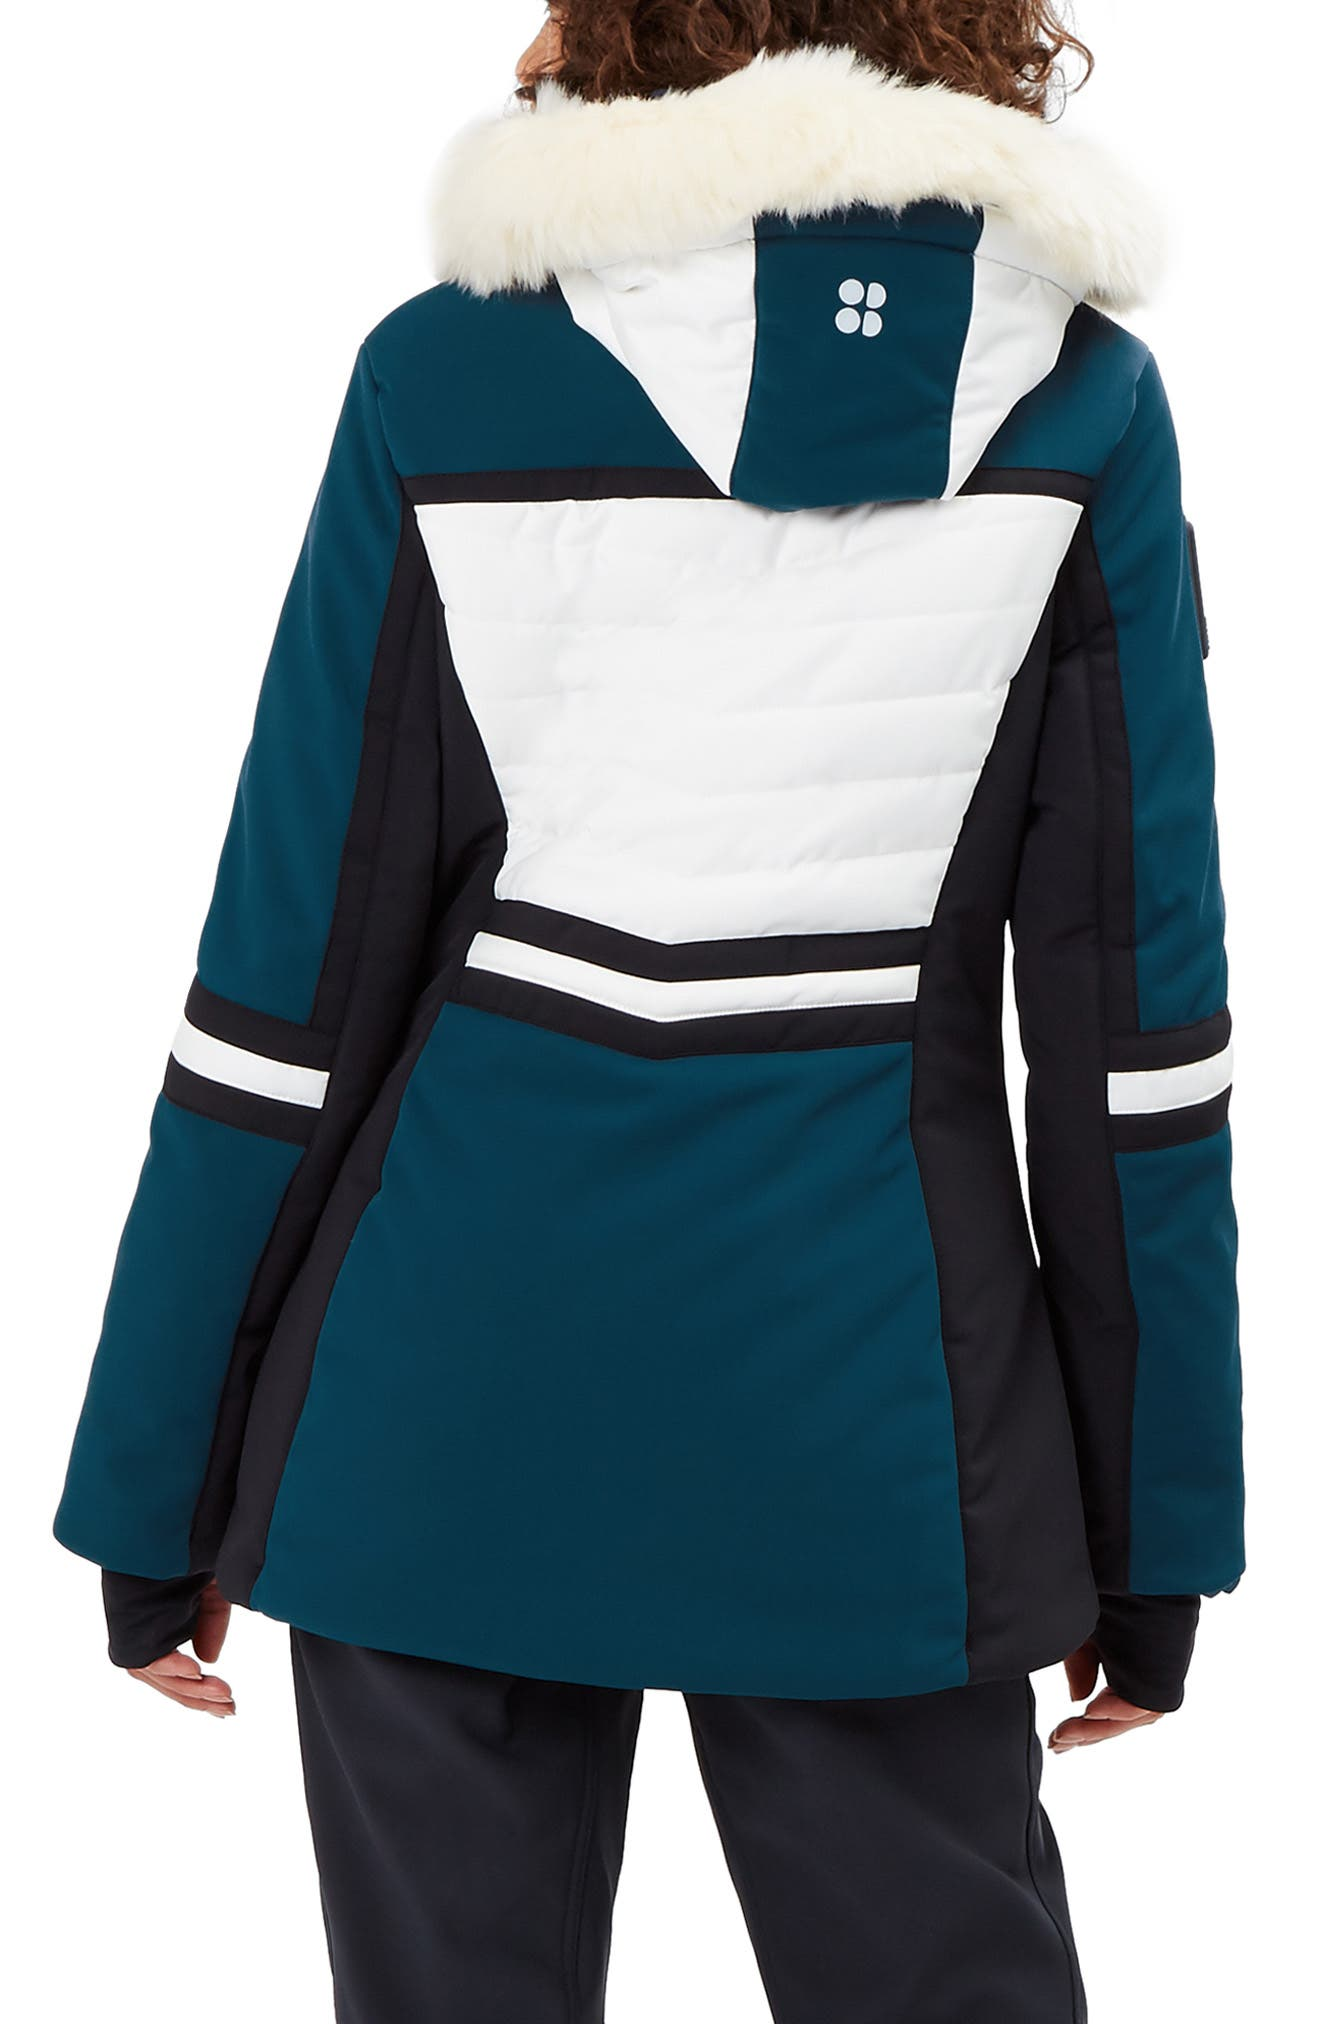 SWEATY BETTY, Method Hybrid Waterproof Ski Jacket with Faux Fur, Alternate thumbnail 2, color, BEETLE BLUE COLOUR BLOCK